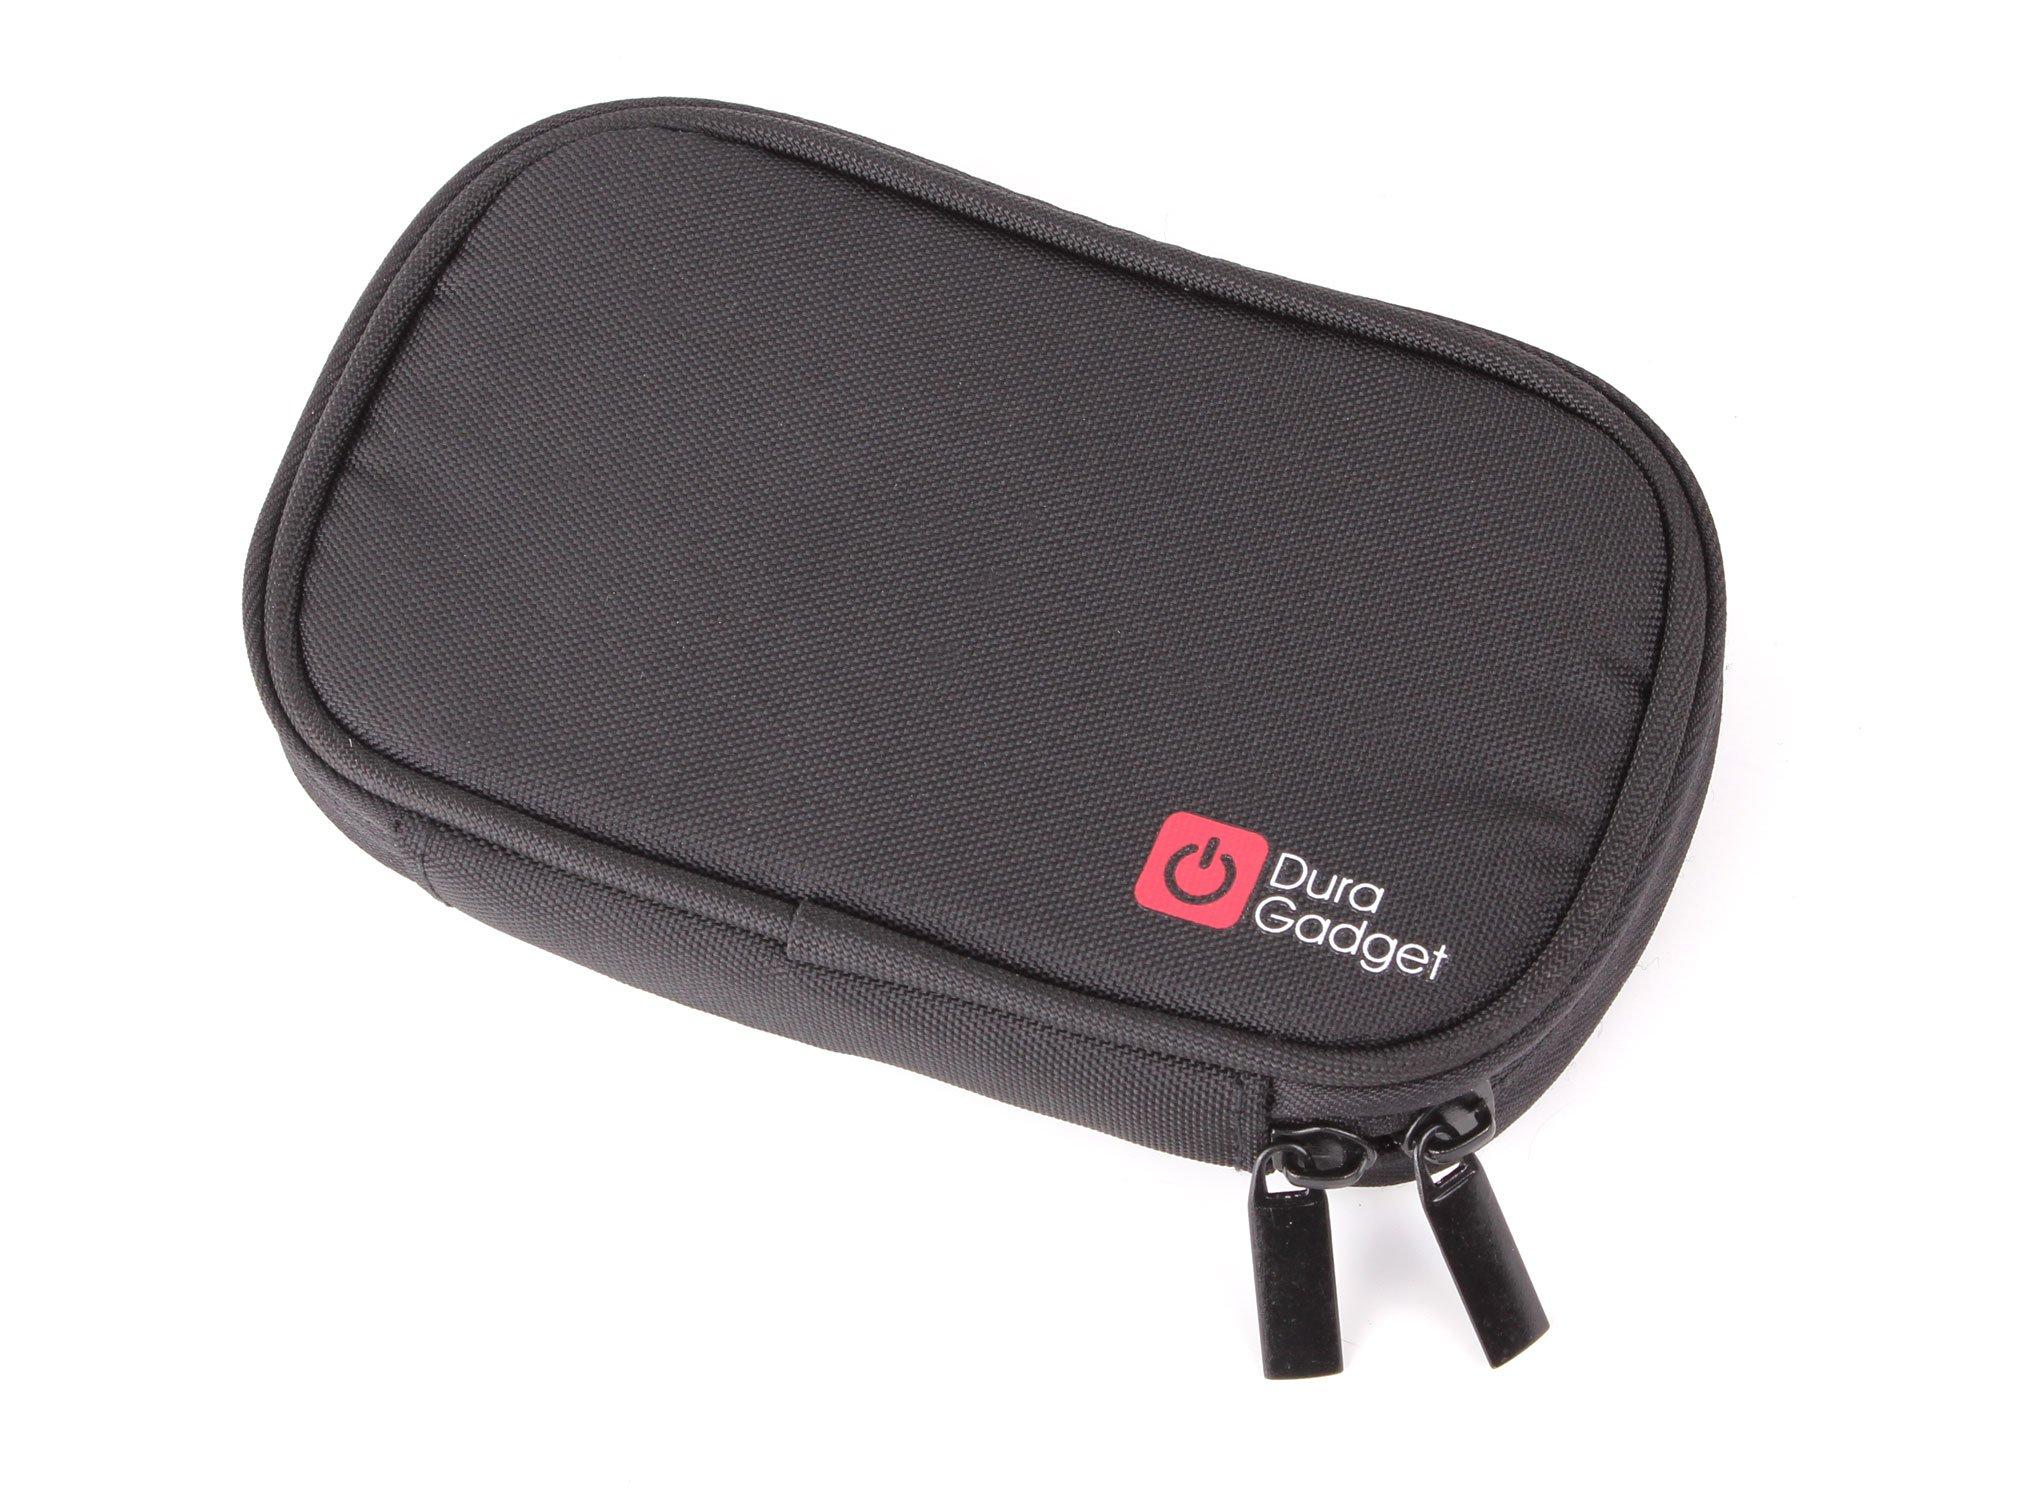 DURAGADGET Handy Garmin Satnav Case - Premium Quality Water Resistant Memory Foam Travel Case with Dual Zips & Belt Loop for Garmin Nuvi 2539LMT, Garmin nuvi 2407, Garmin nuvi 2467LM, Garmin nüvi 2517LM, Garmin nüvi 2545LMT & Garmin Dezl 570 LMT-D 5-Inc